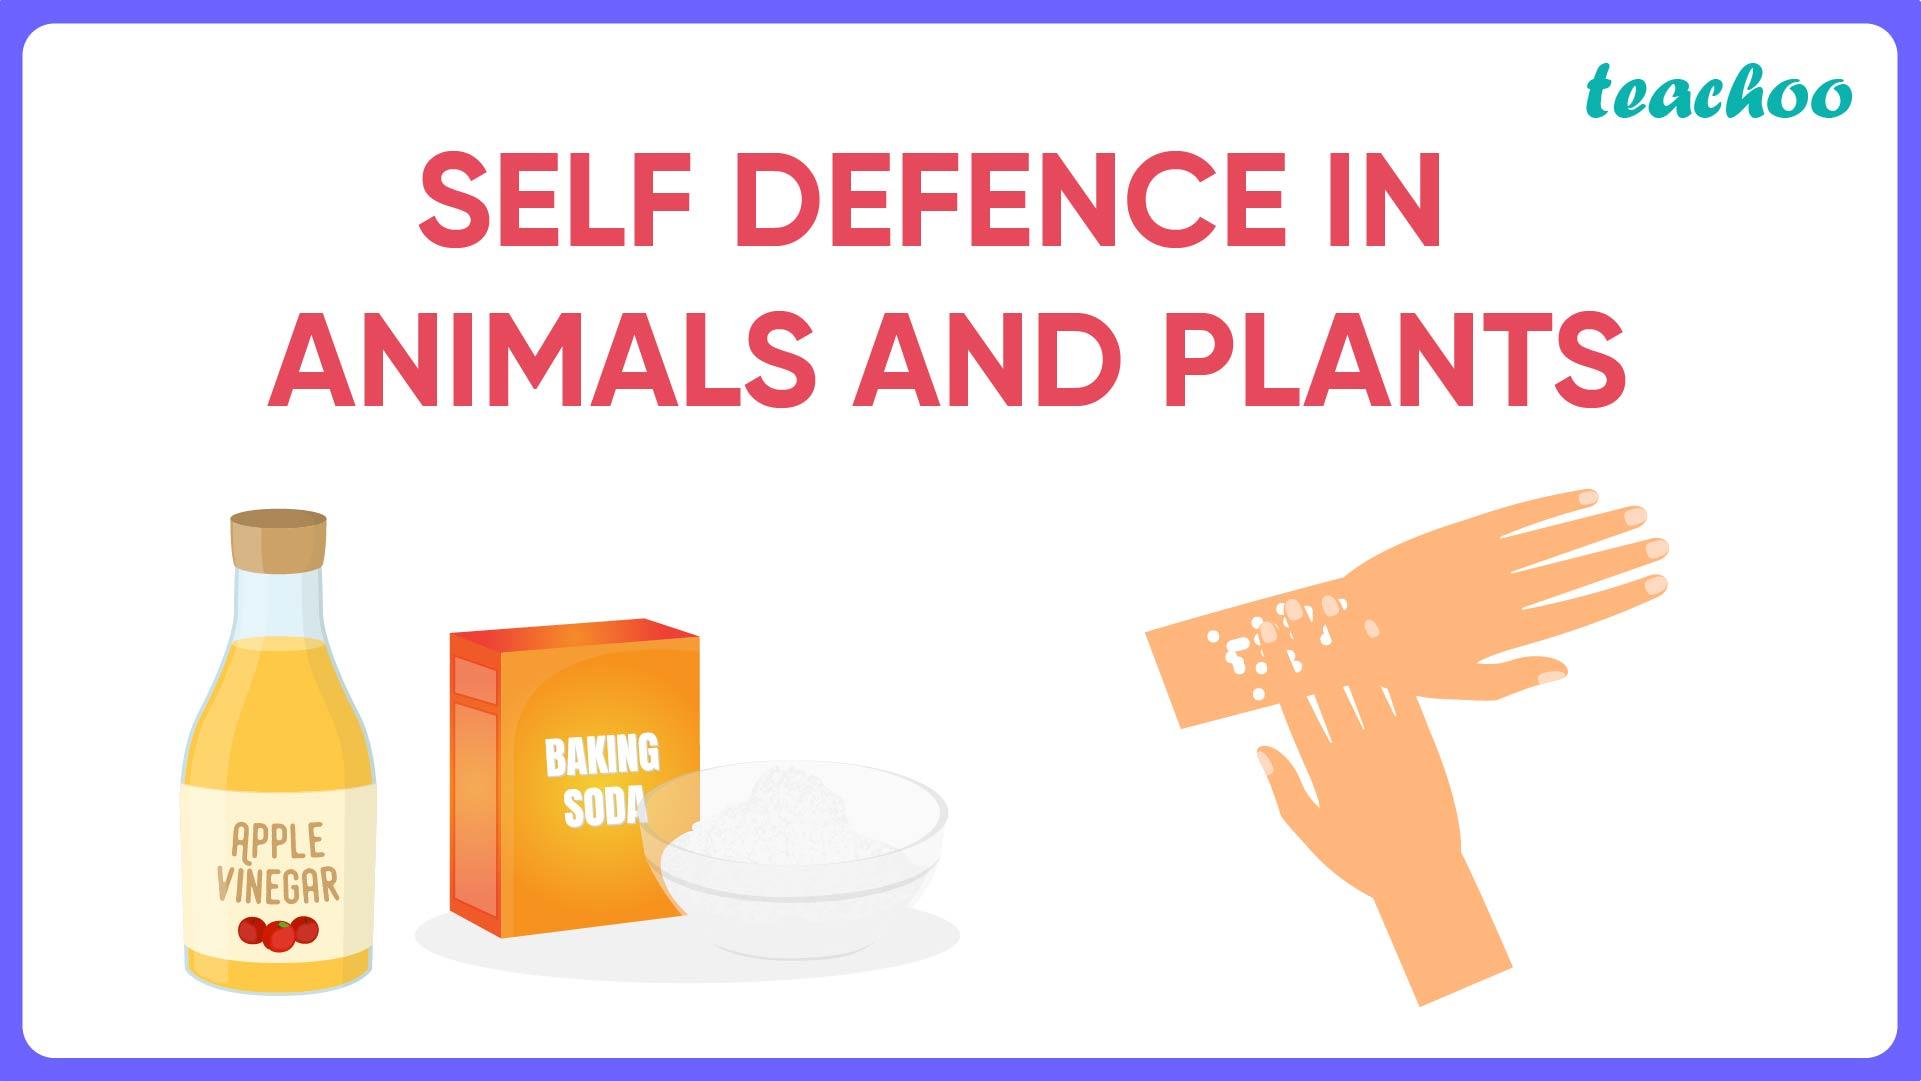 Self Defence in Animals and Plants-Teachoo.jpg